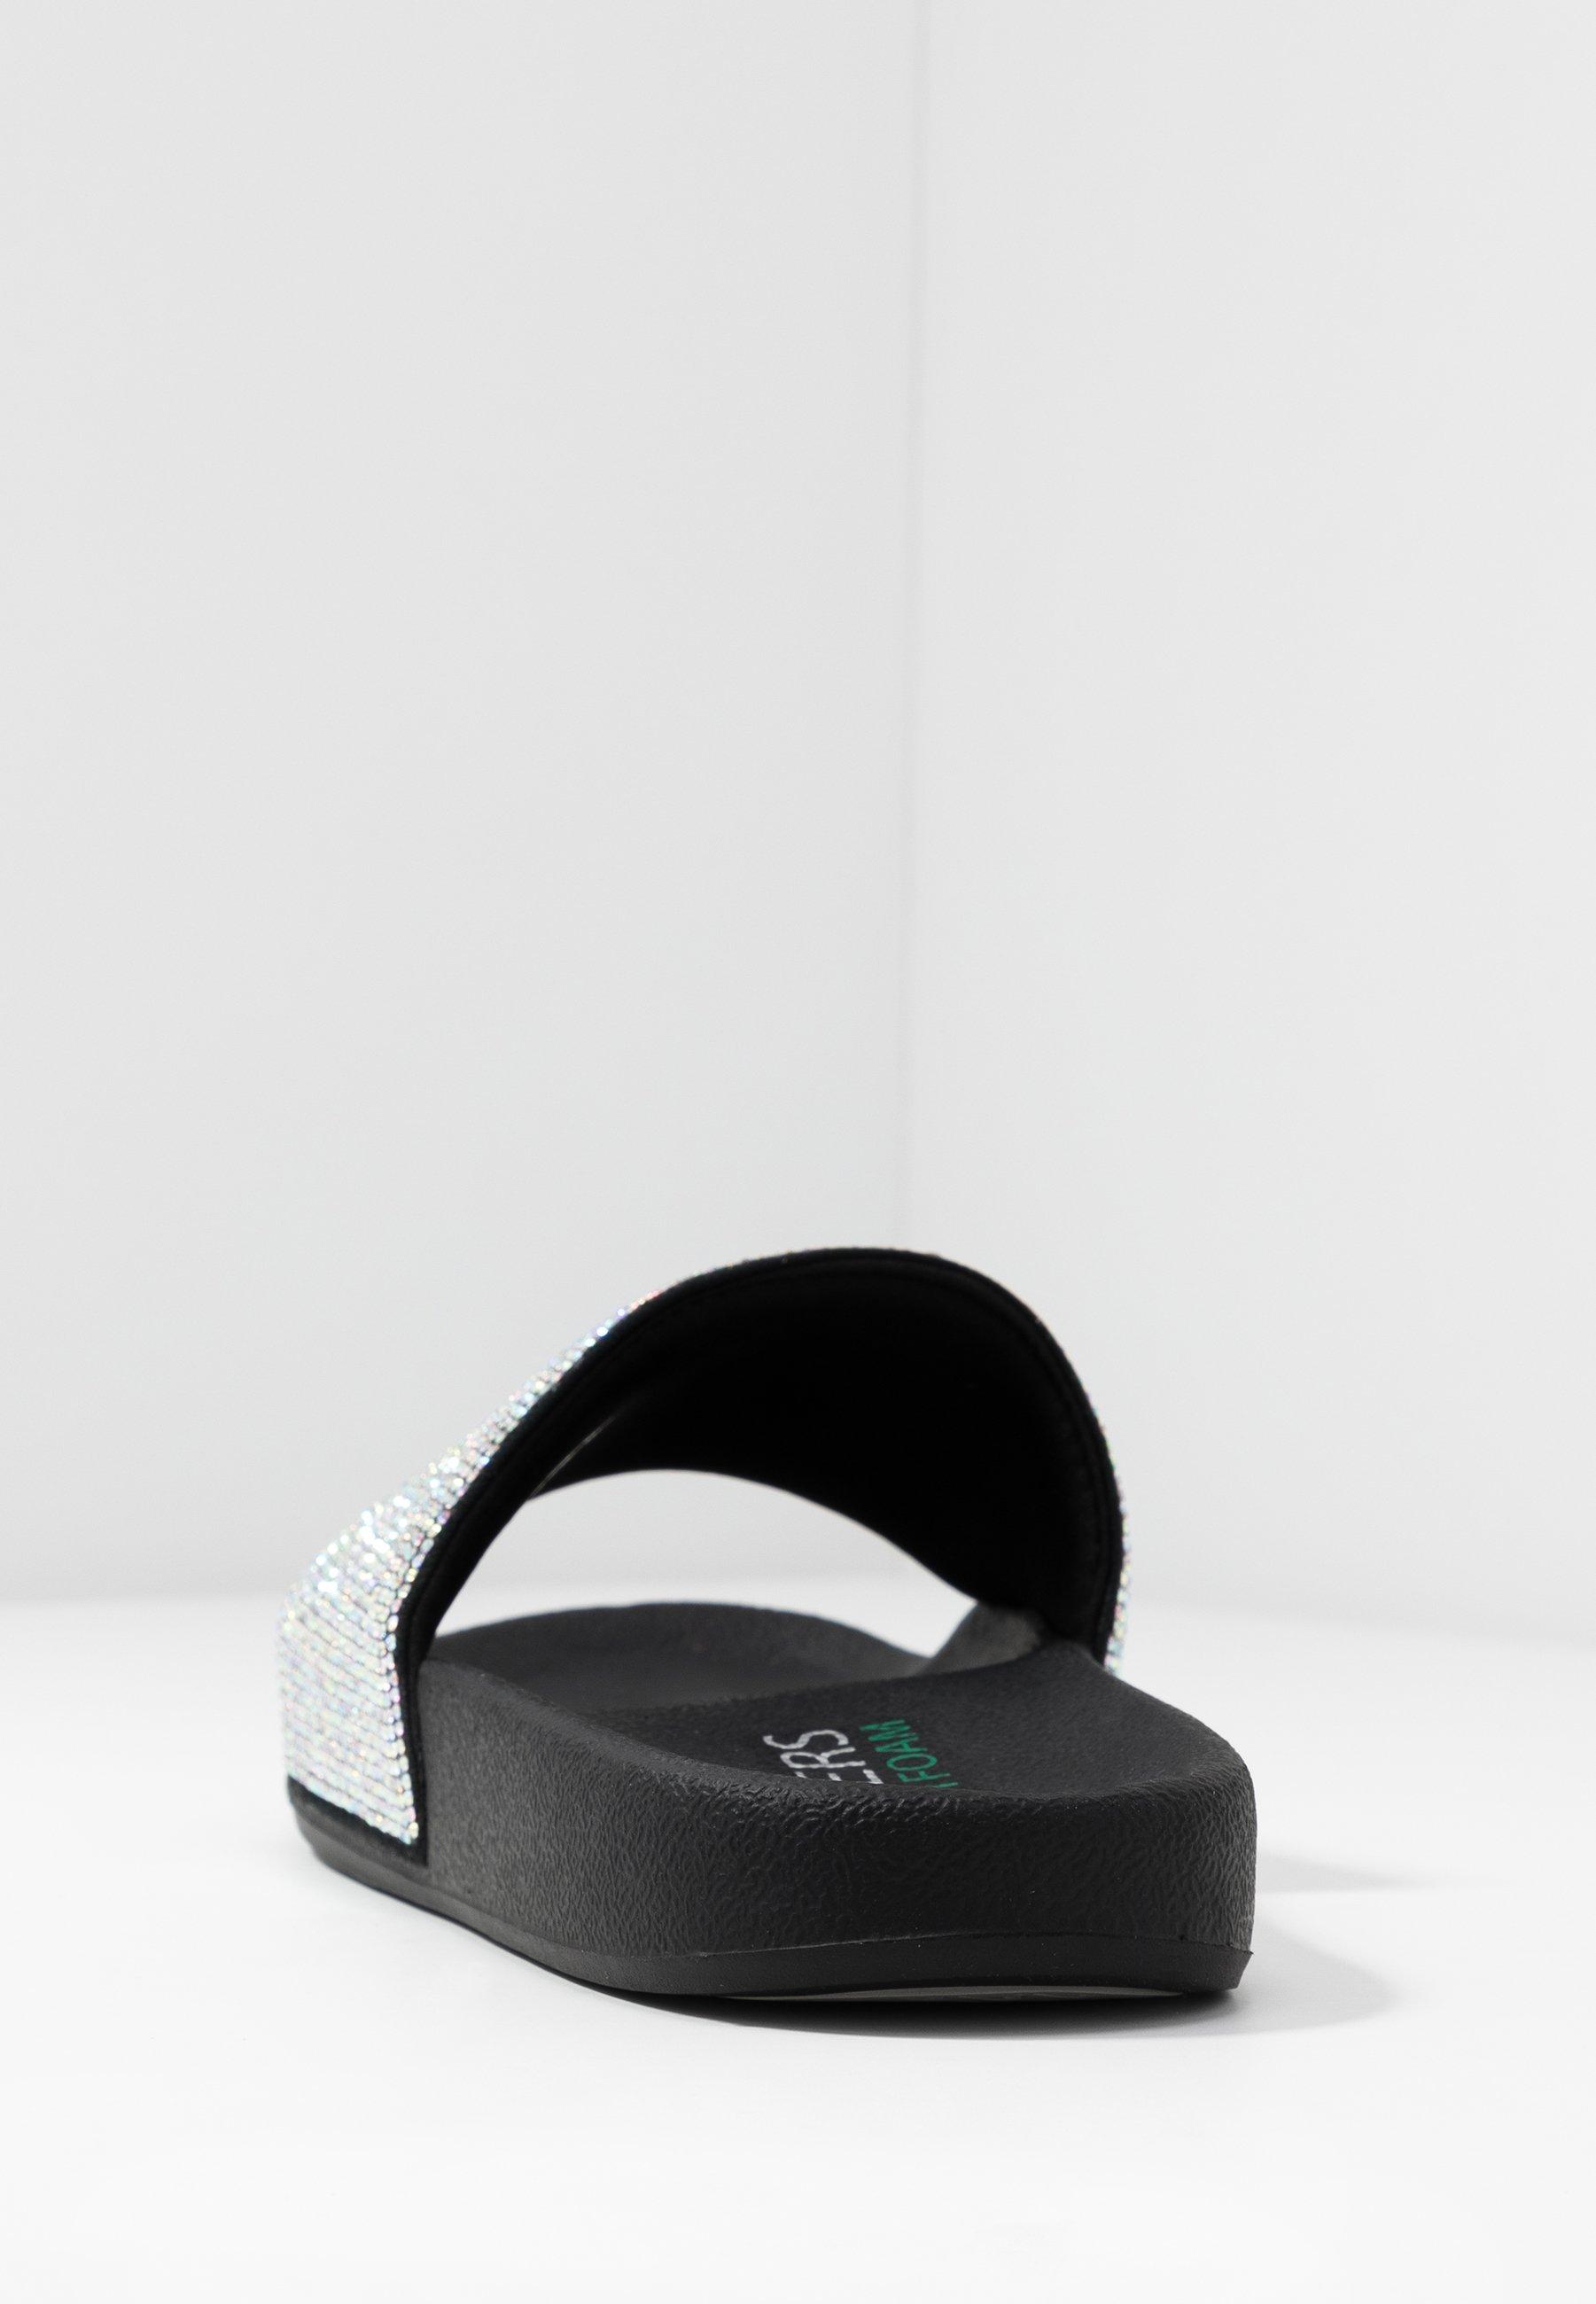 Skechers Sport Pop Ups - Ciabattine Black /iridescent ZN8hz